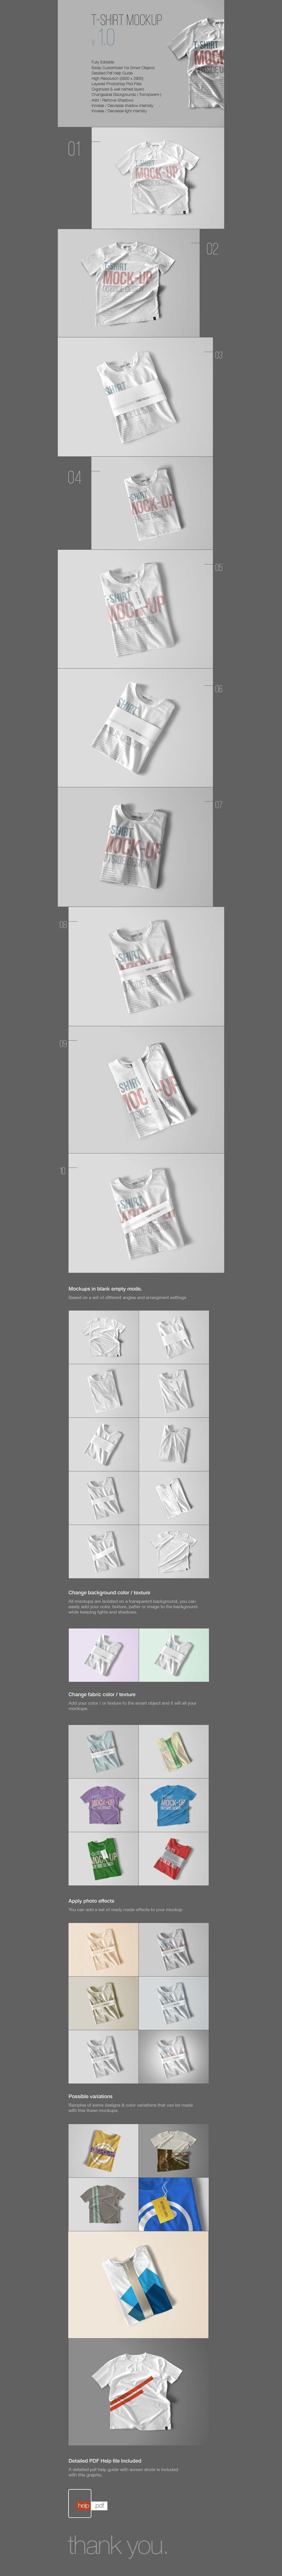 Free PSD T-Shirt Mockup Template #free #mockup #photoshop #t-shirt